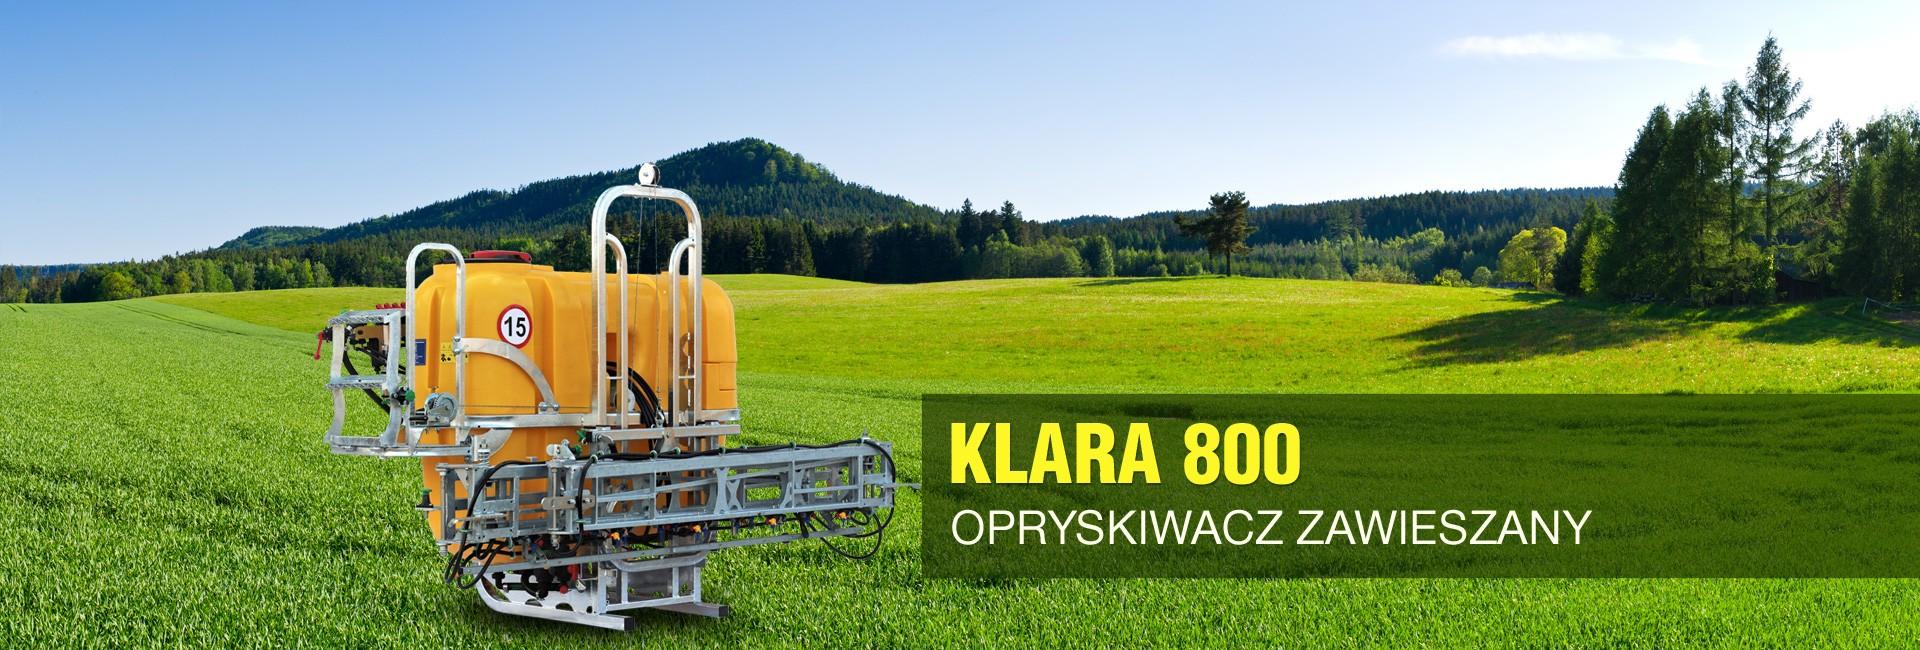 KLARA 800 LITRÓW